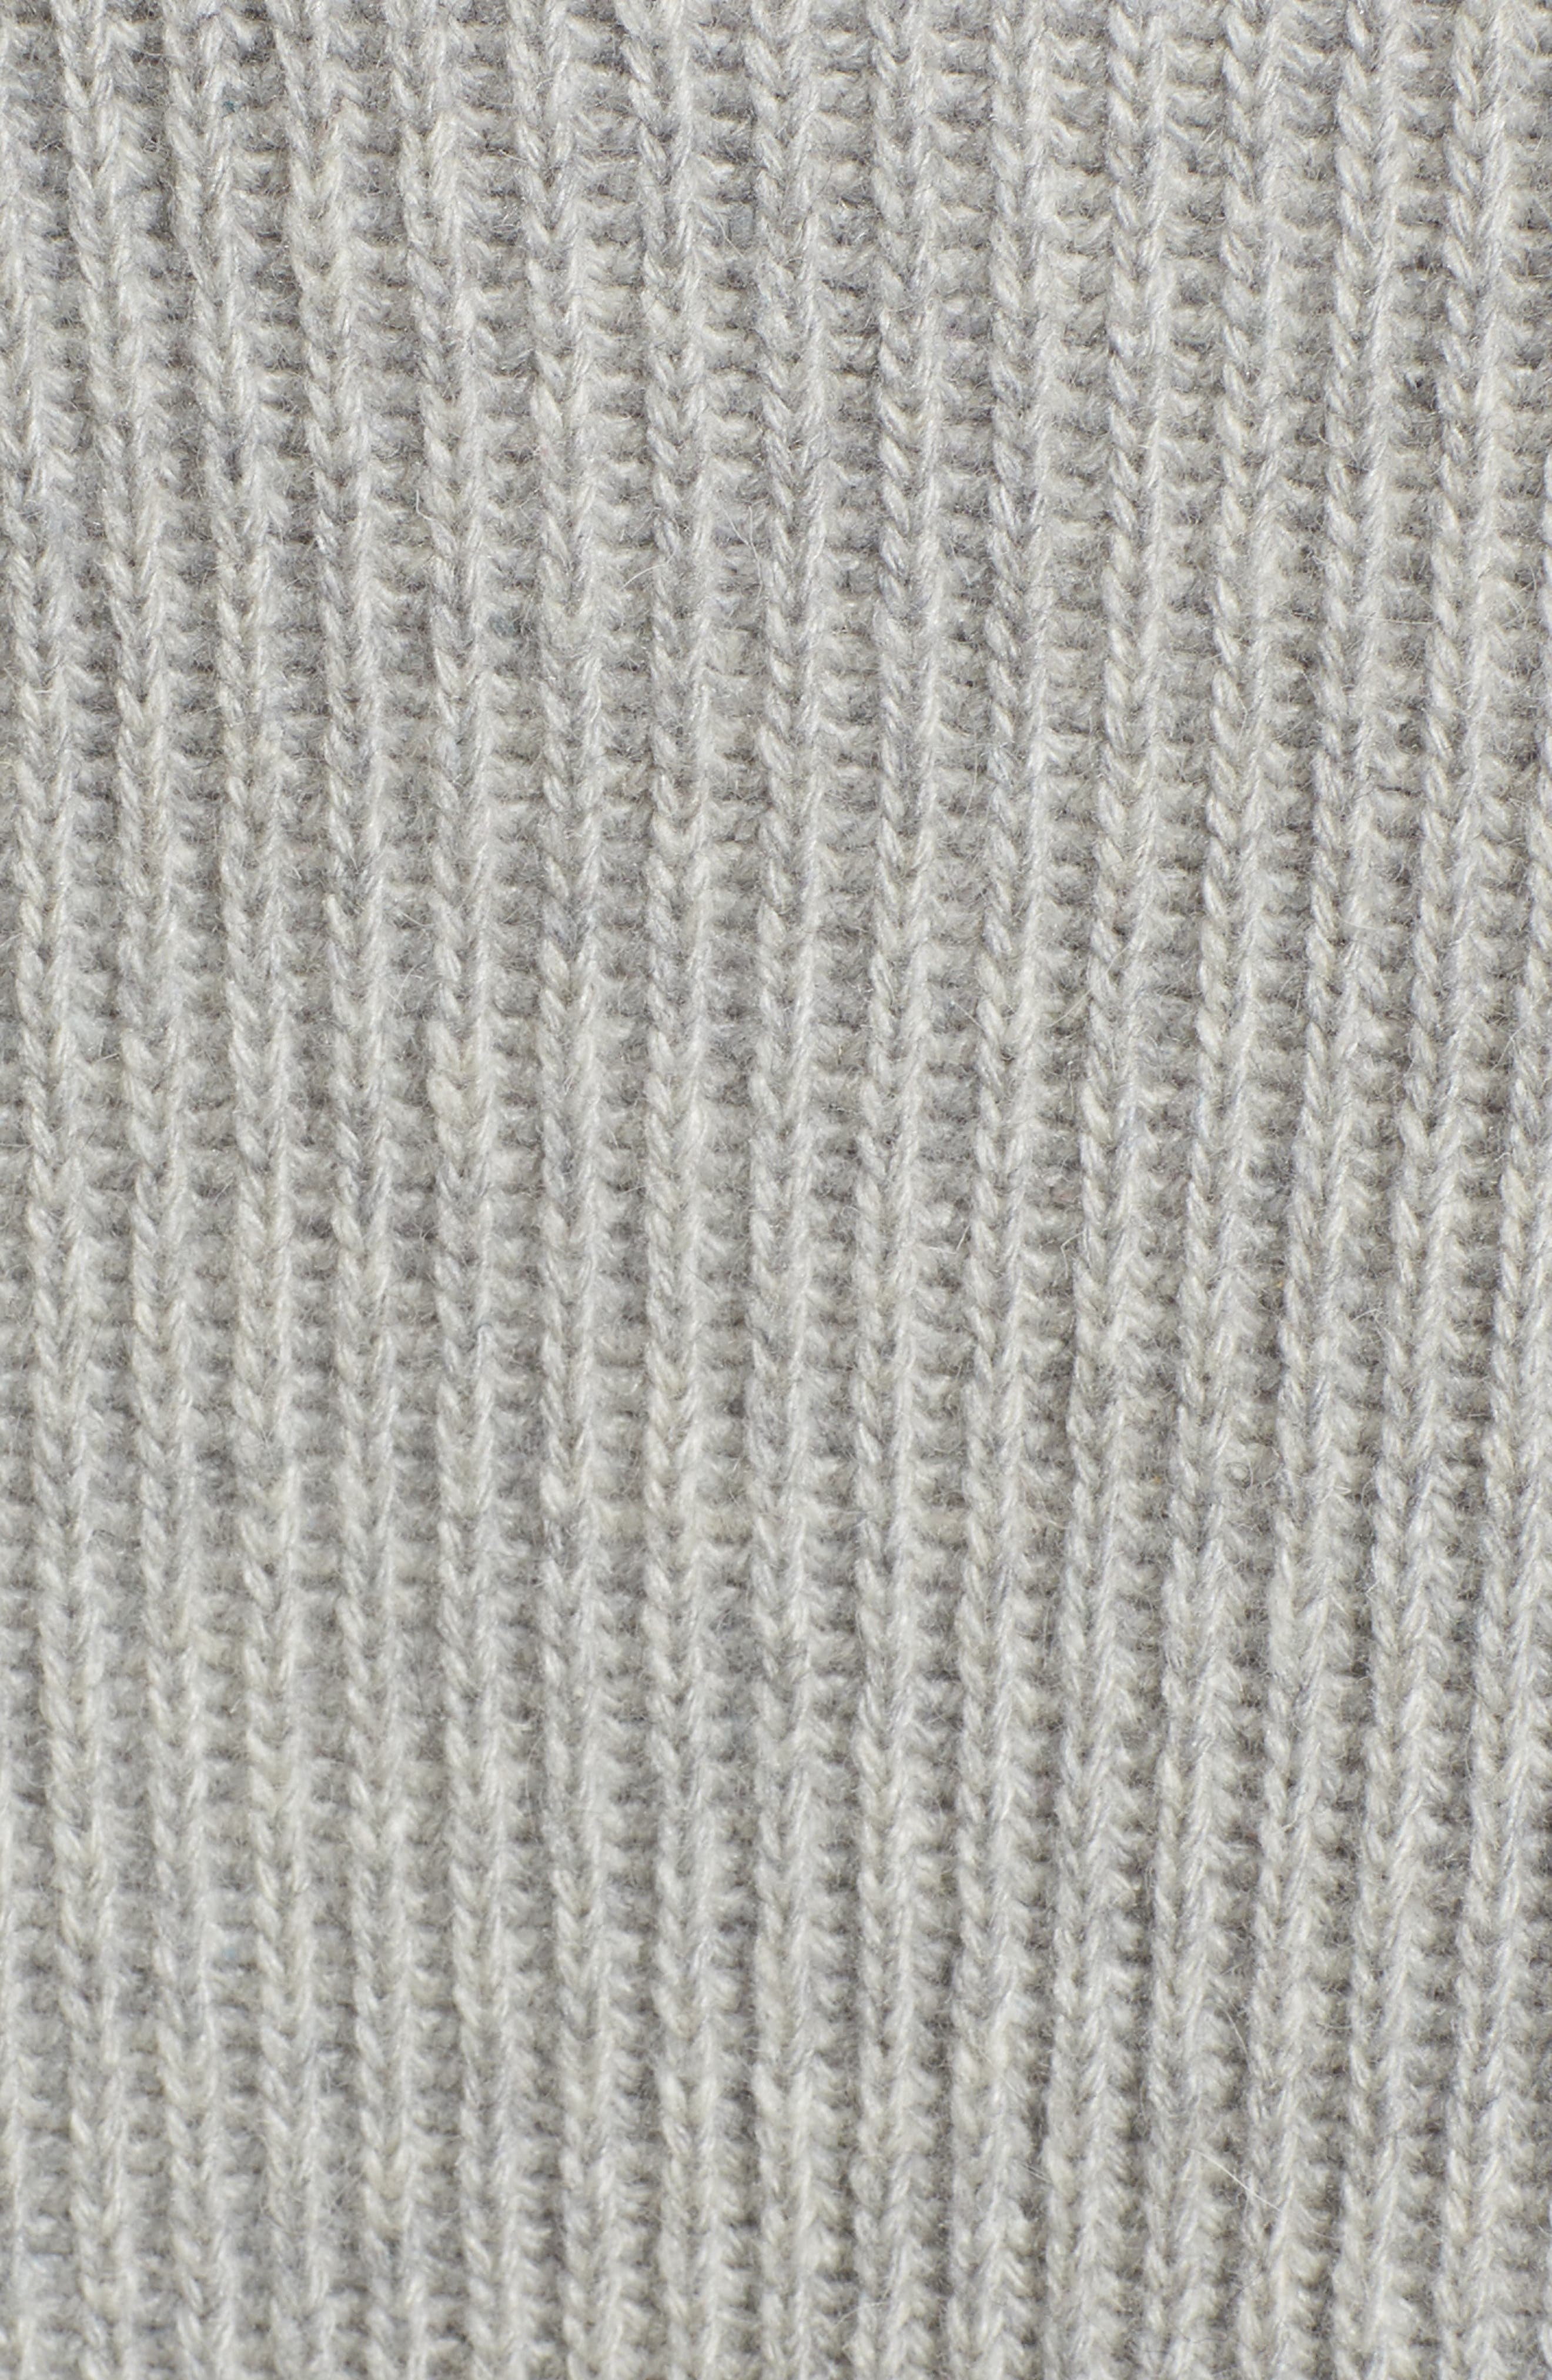 Unbalanced Pattern Wool Blend Sweater,                             Alternate thumbnail 5, color,                             313